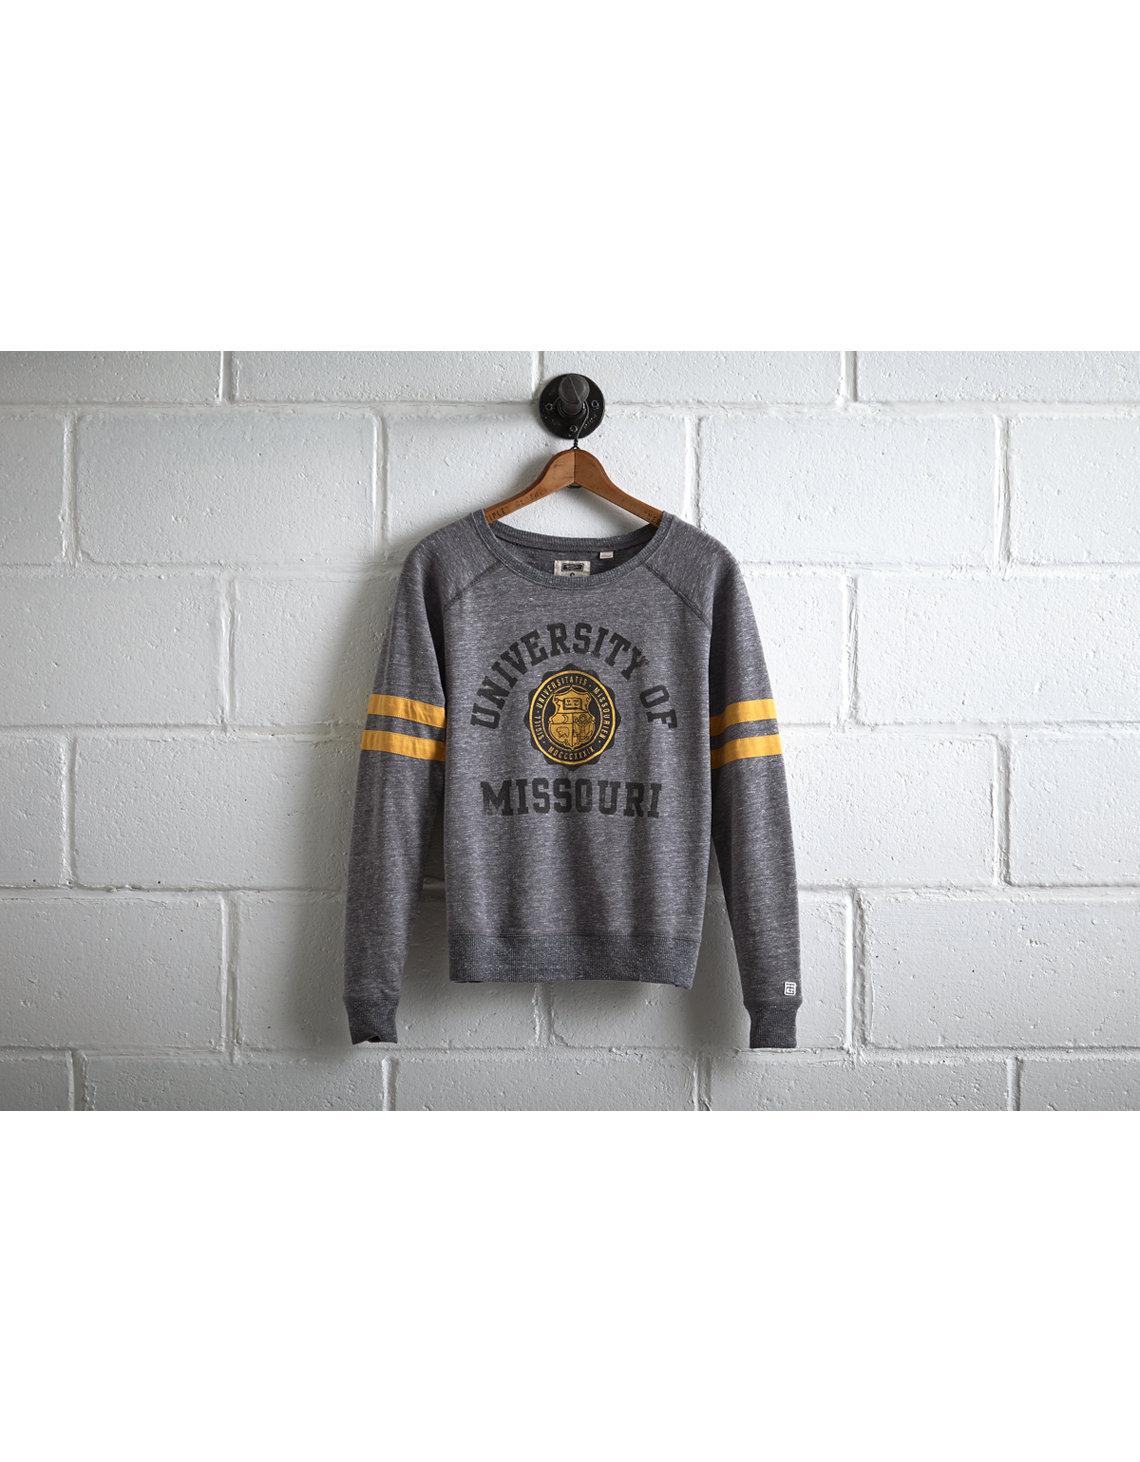 59cfba675a2073 lacoste crewneck fleece tennis sweatshirt gray crewnecks sh7613 00 ...